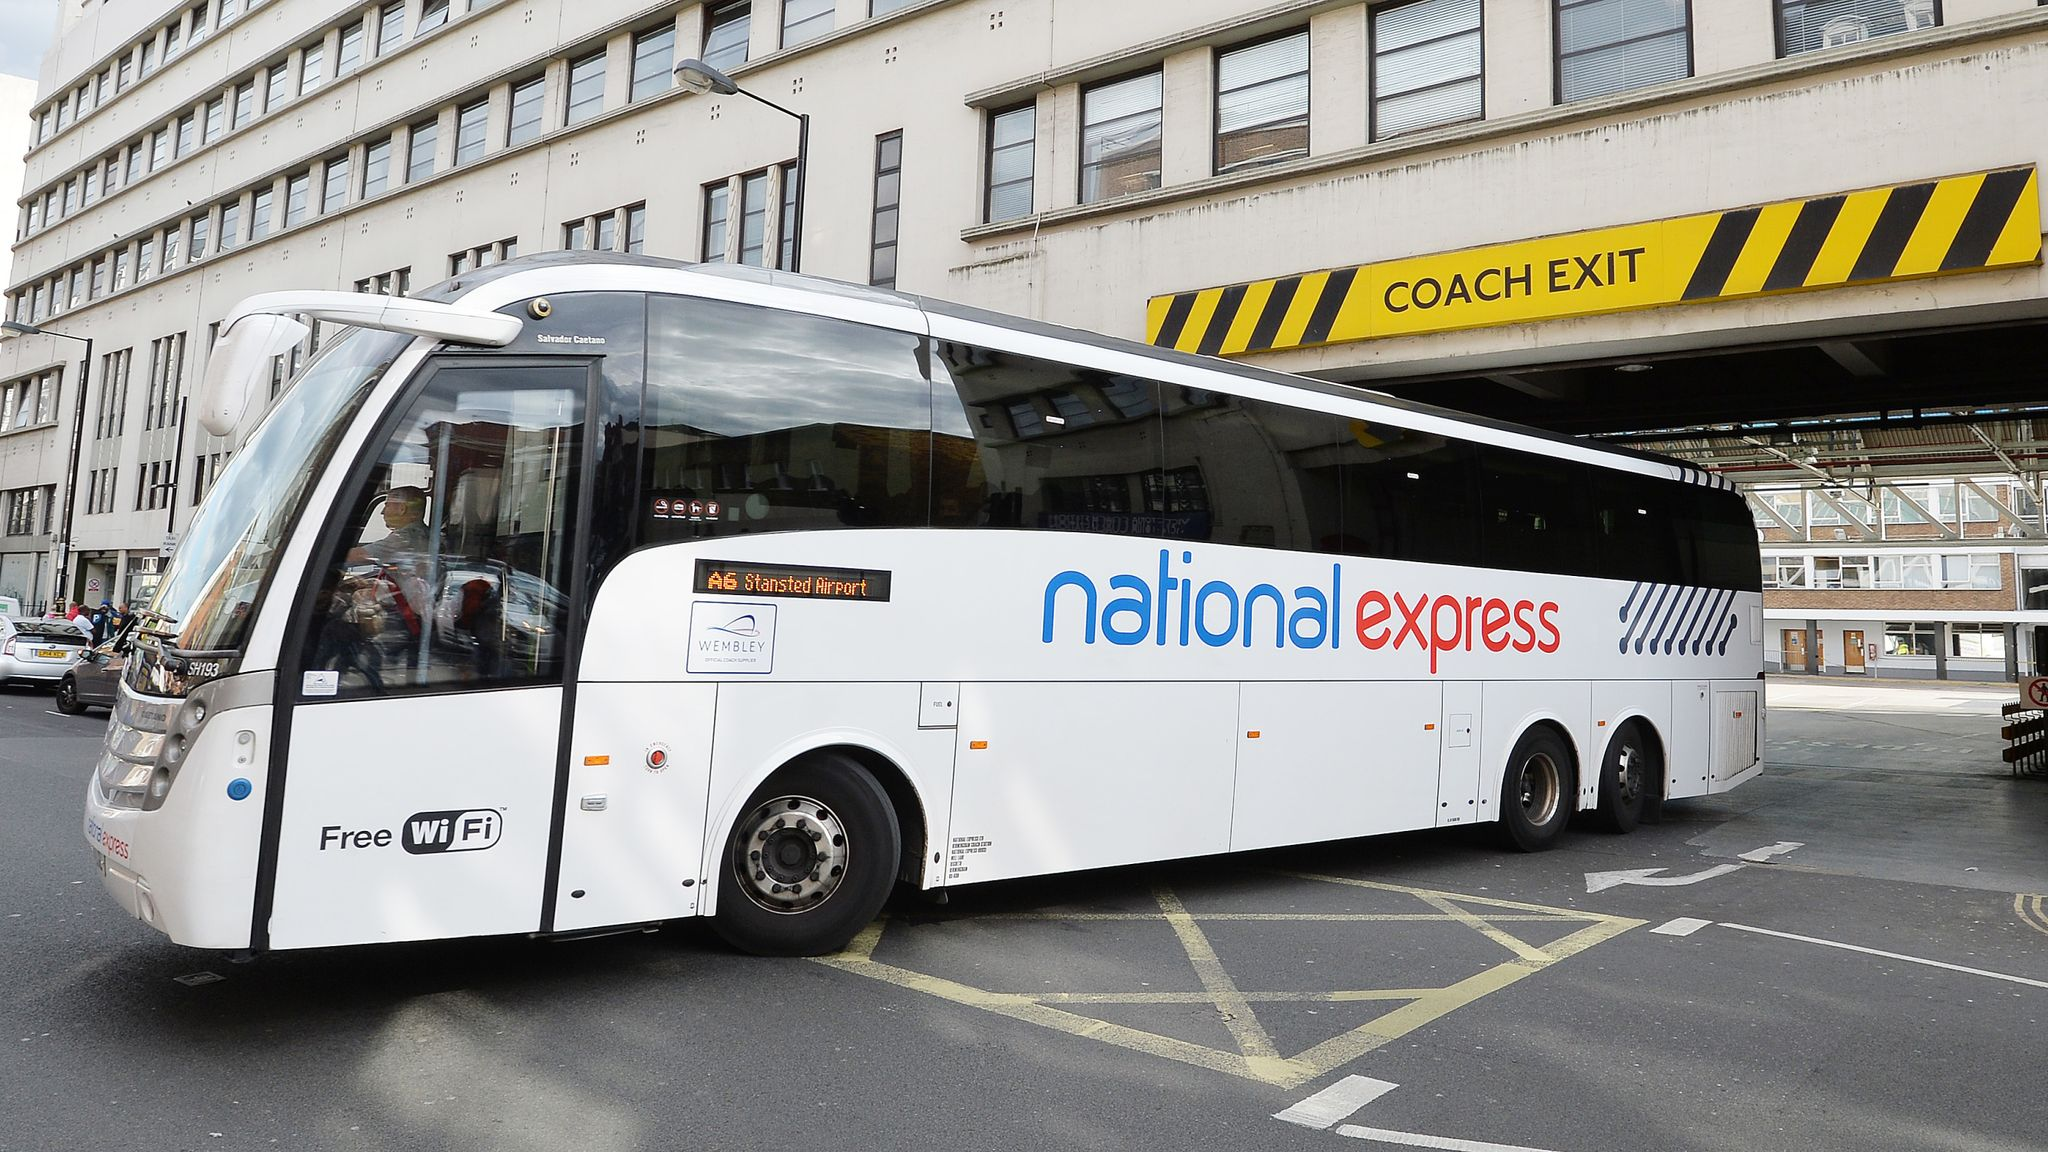 skynews-national-express-business_4854868.jpg